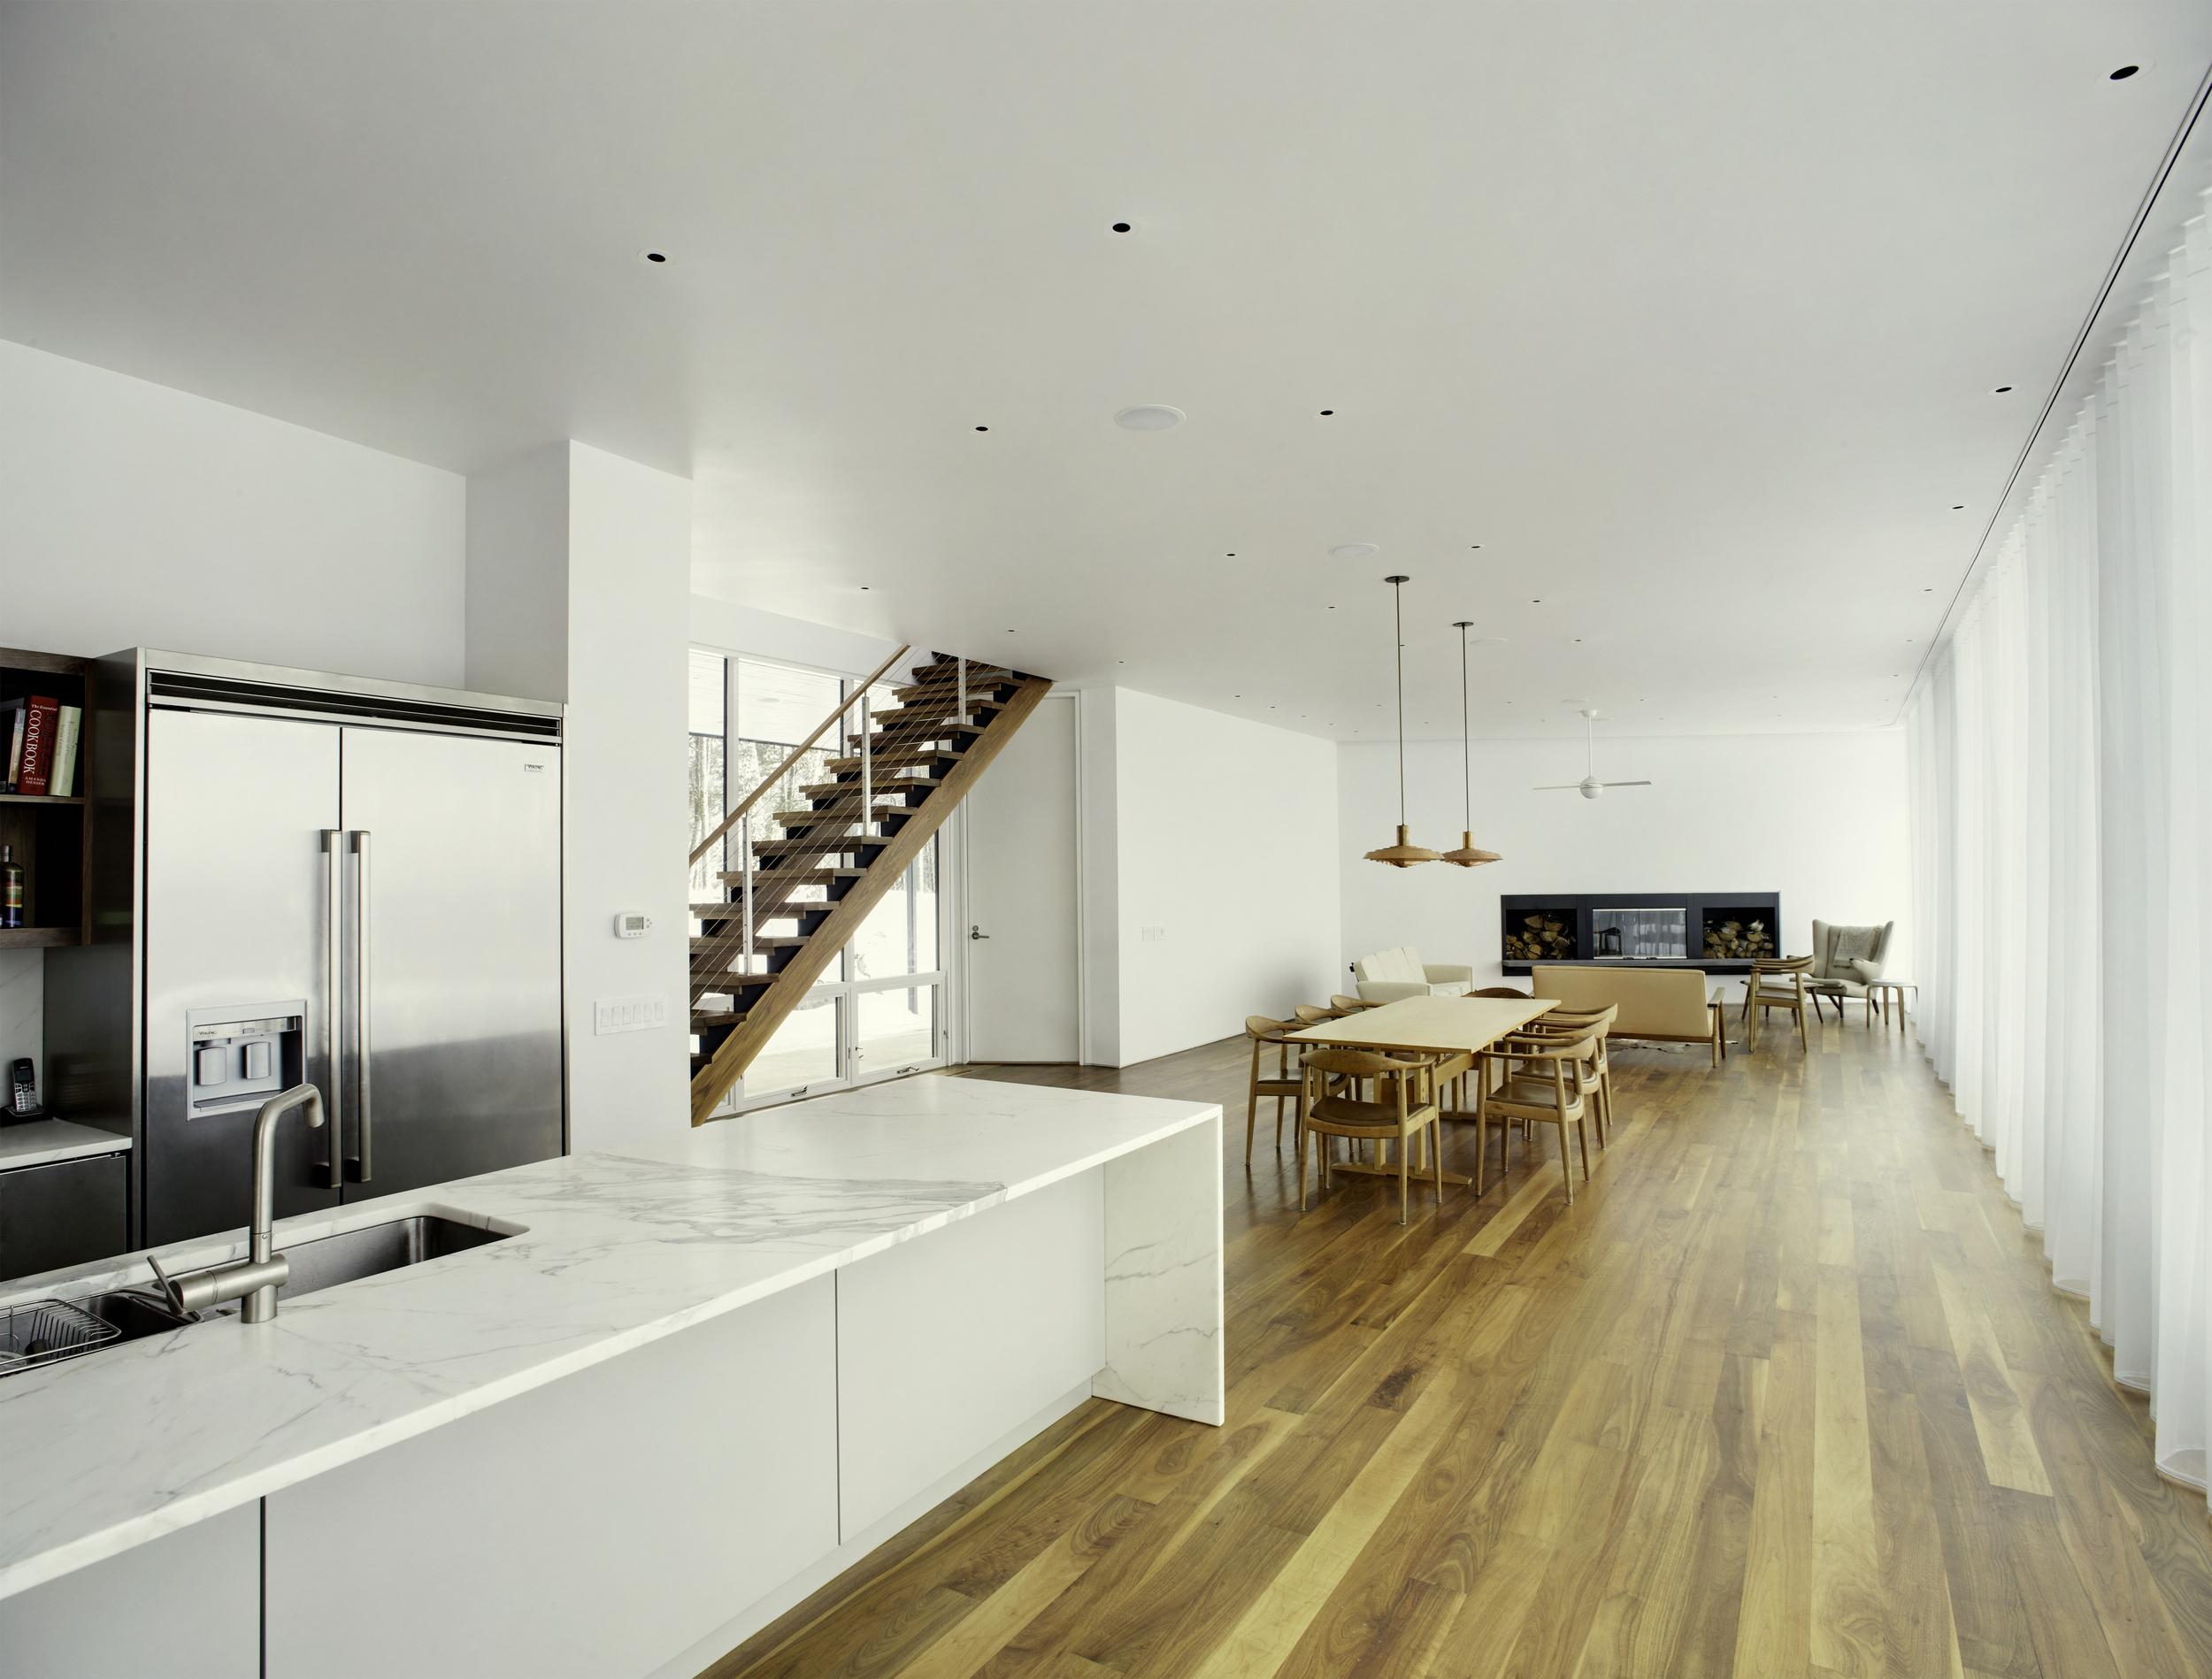 wood floors marble countertops stainless steel kitchen